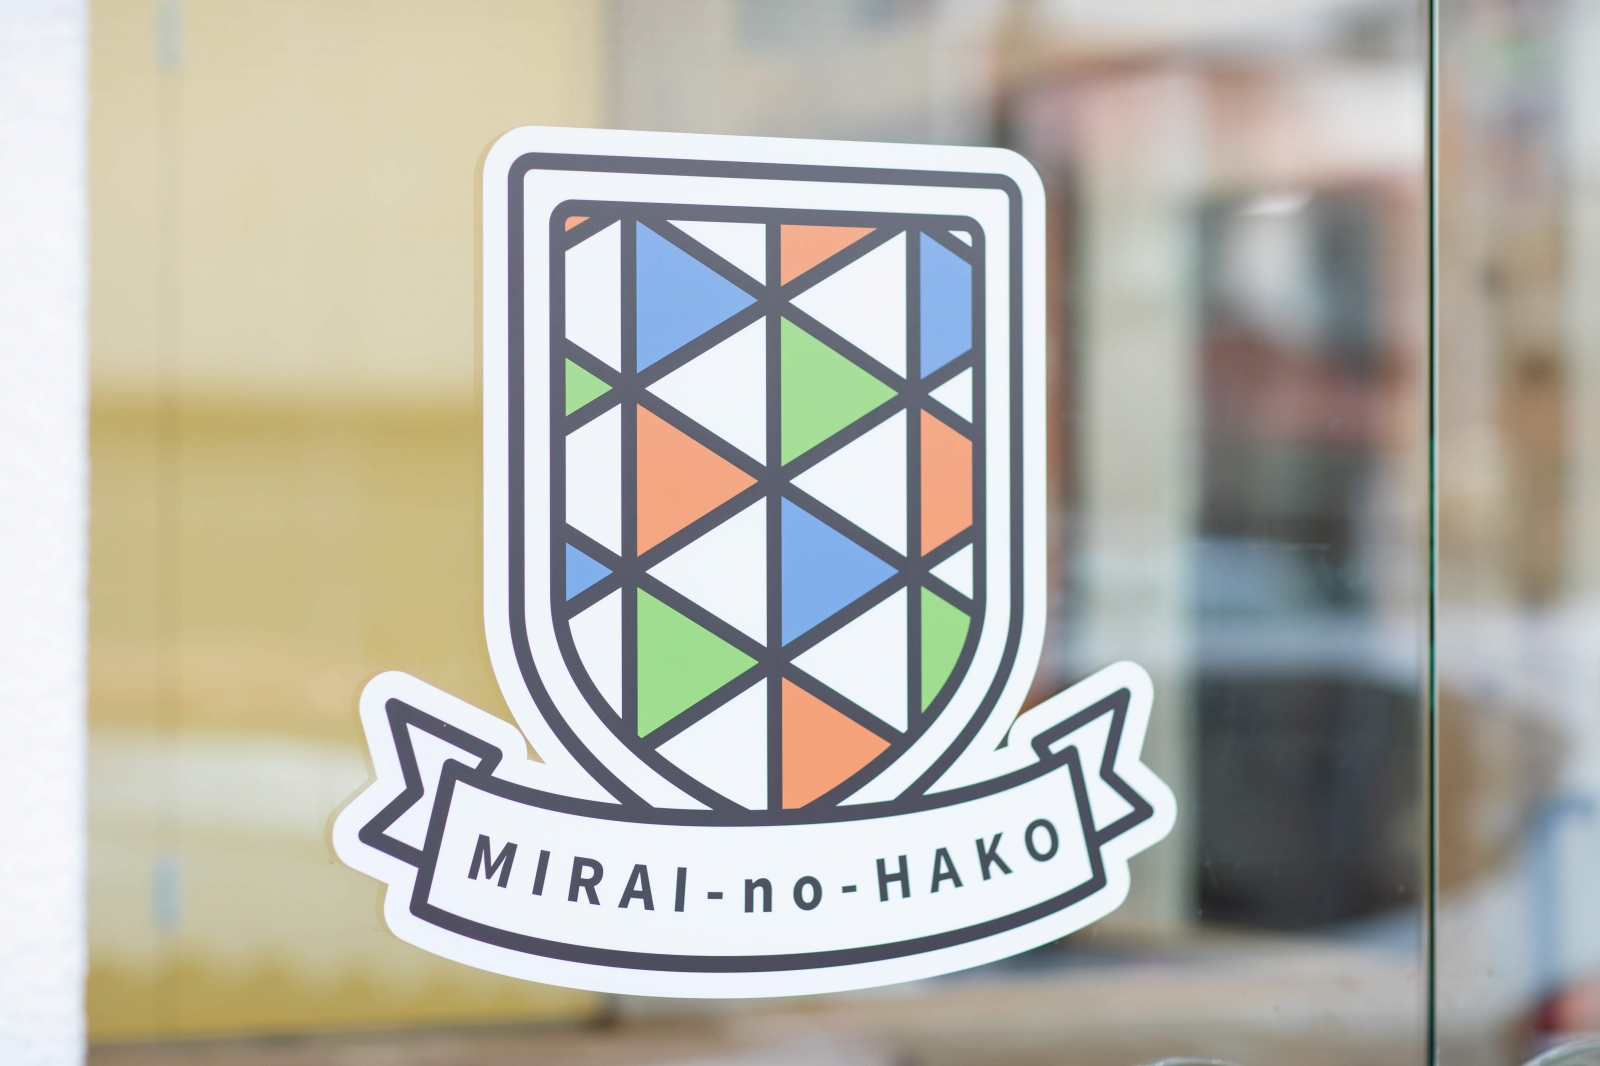 Mirai no Hako Portuguese Guide